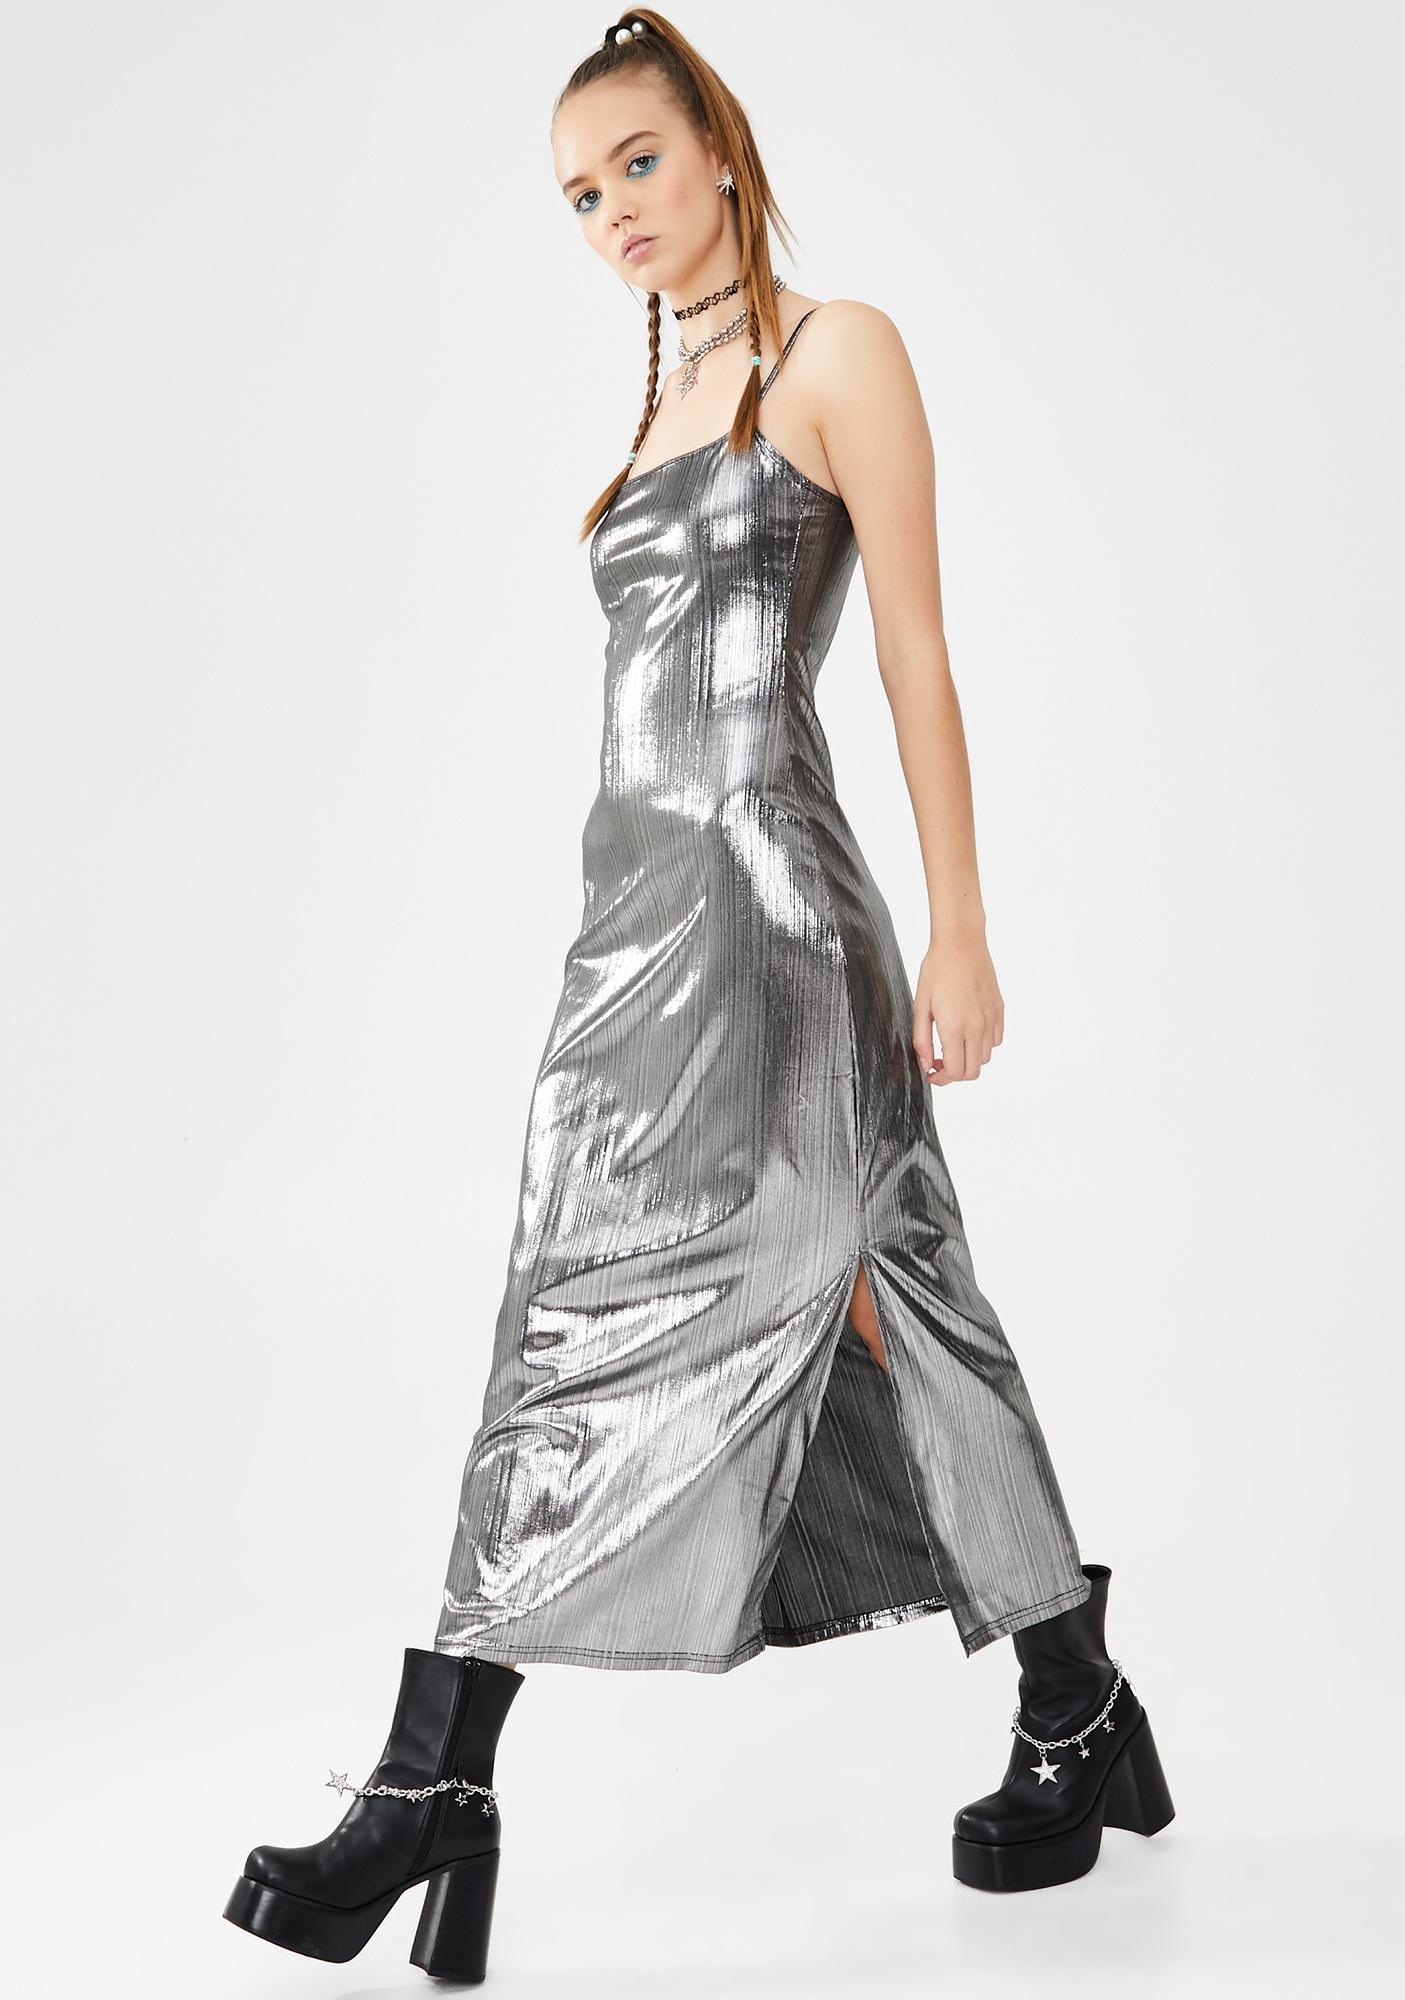 dELiA*s by Dolls Kill Divalicious Metallic Maxi Dress